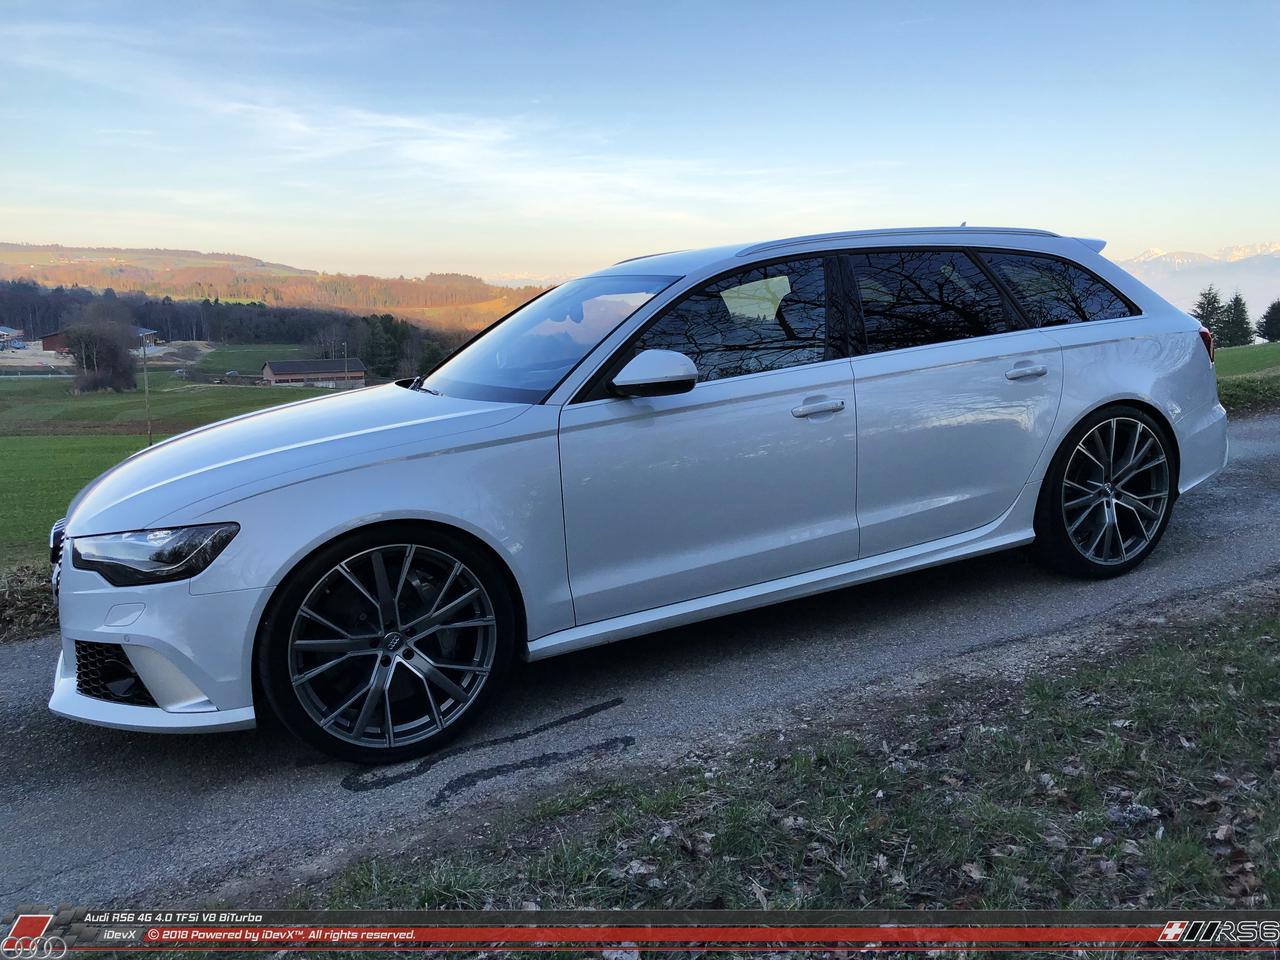 22_02.2019_Audi-RS6_iDevX_008.png